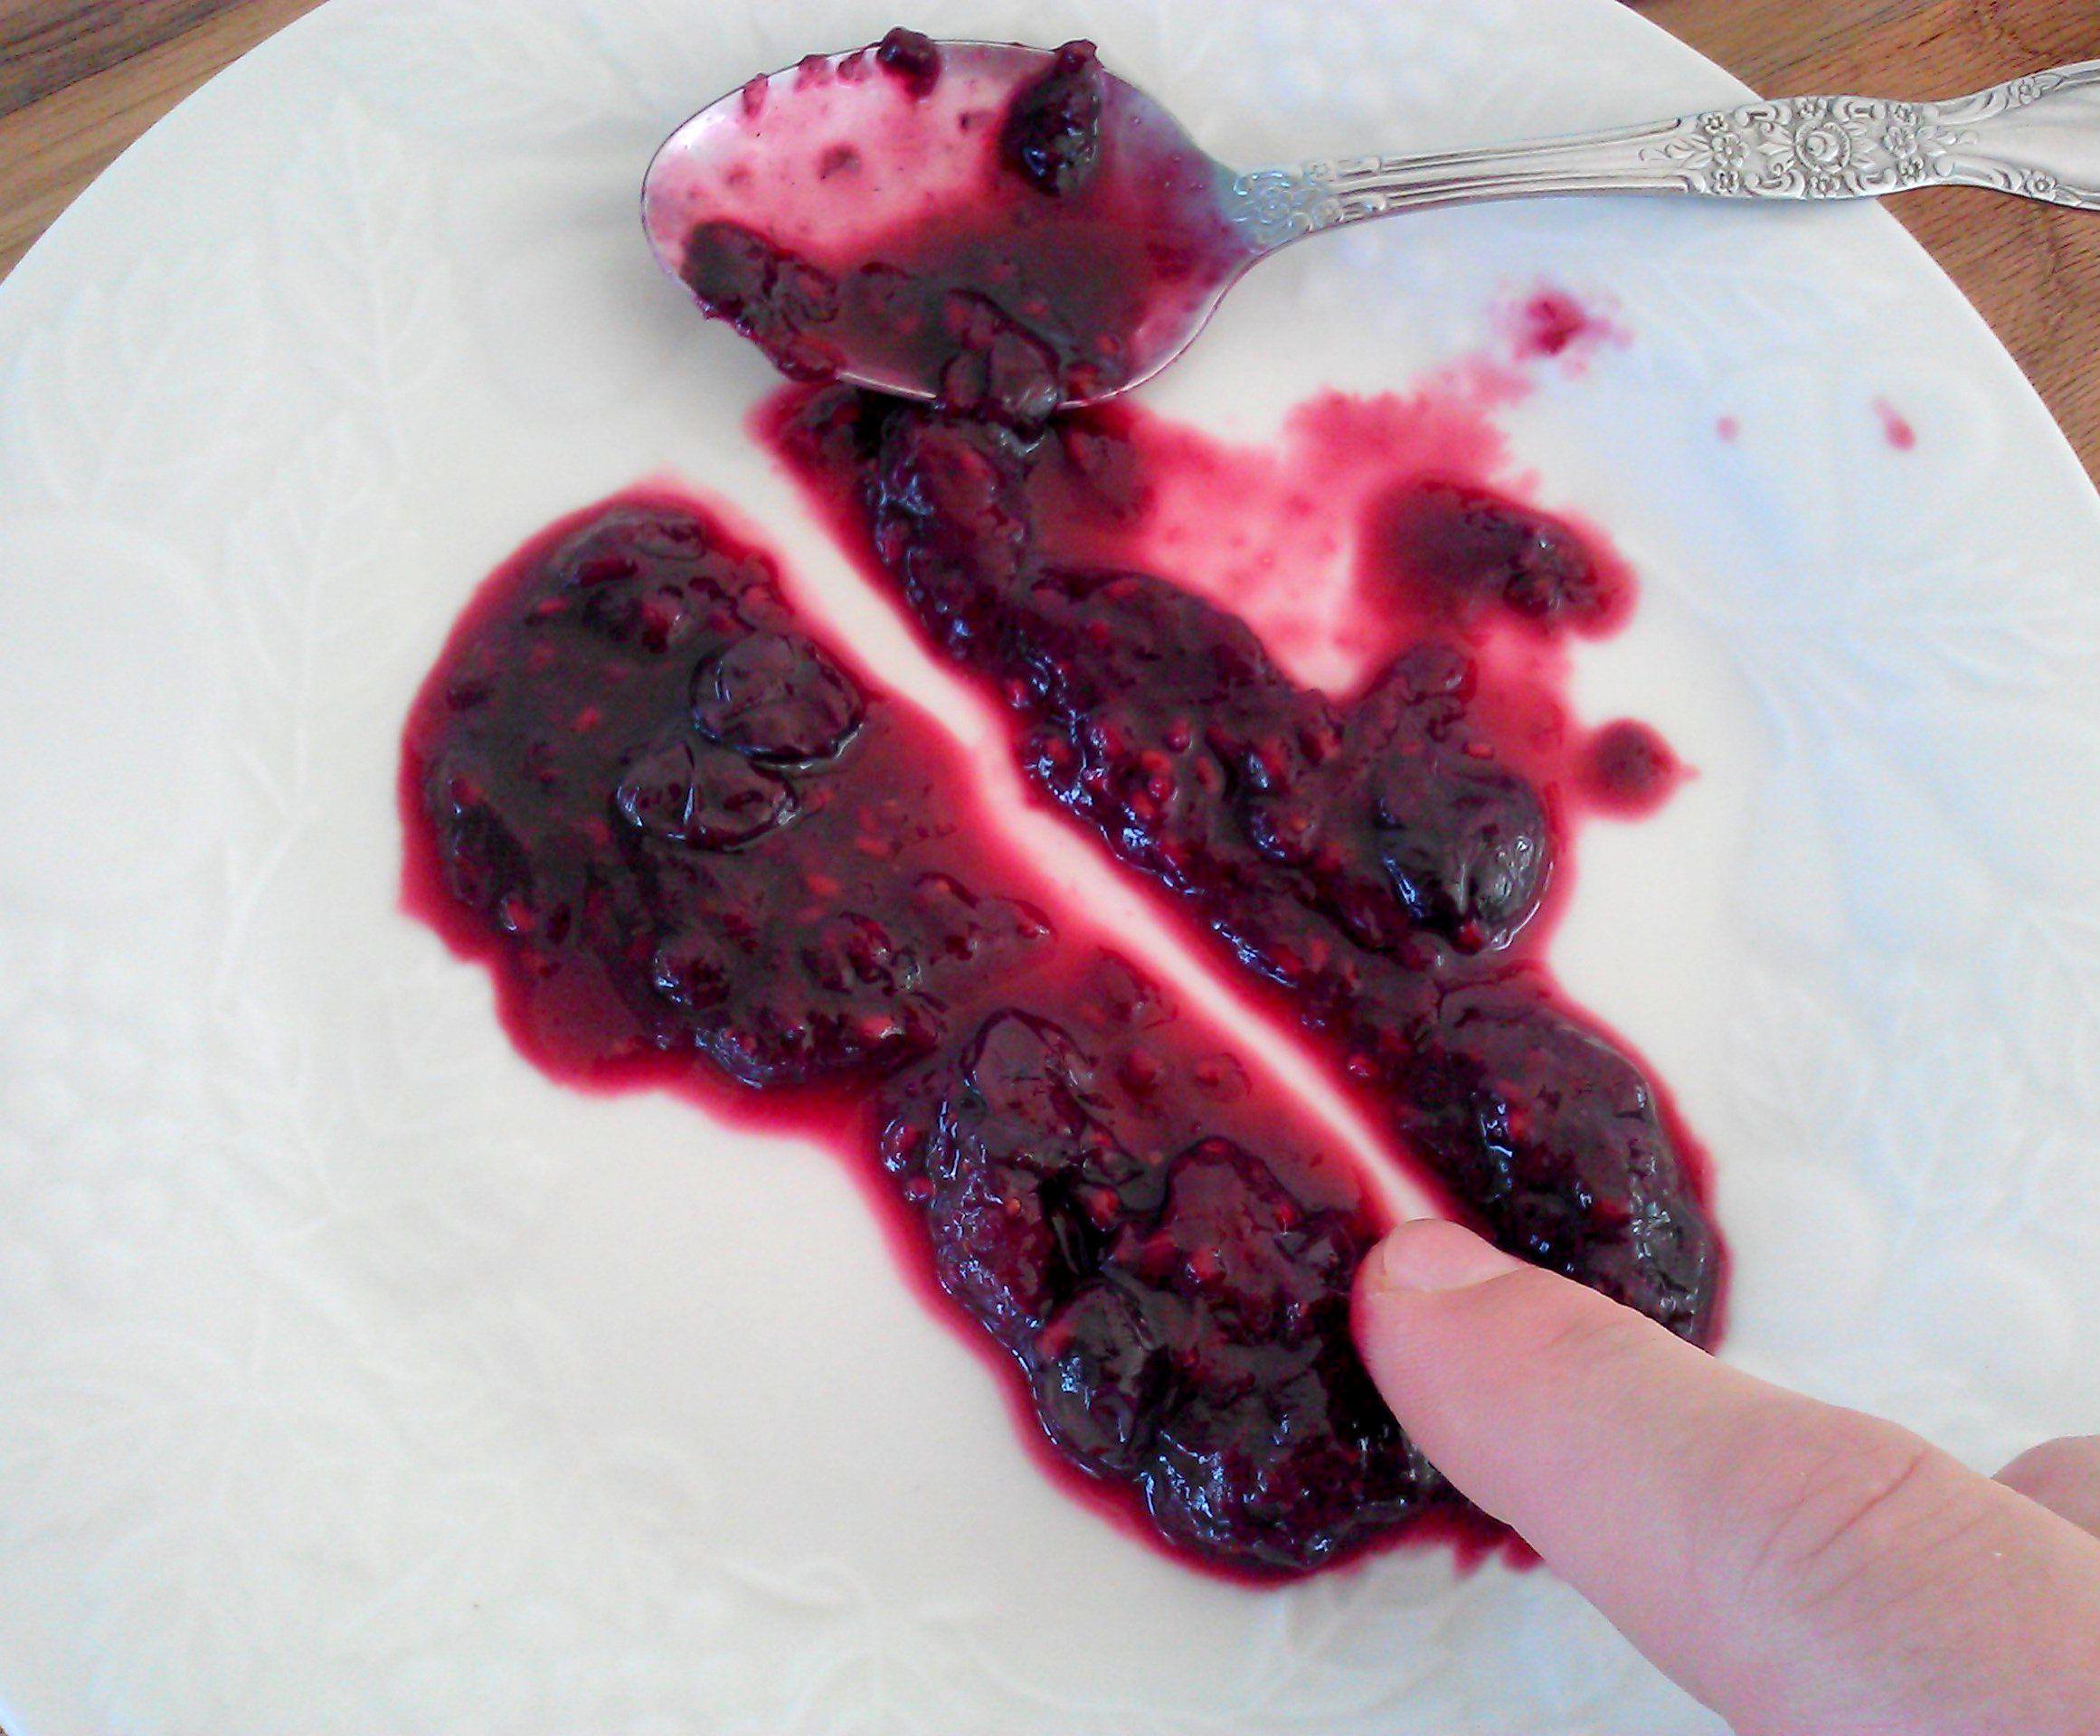 berryfinger